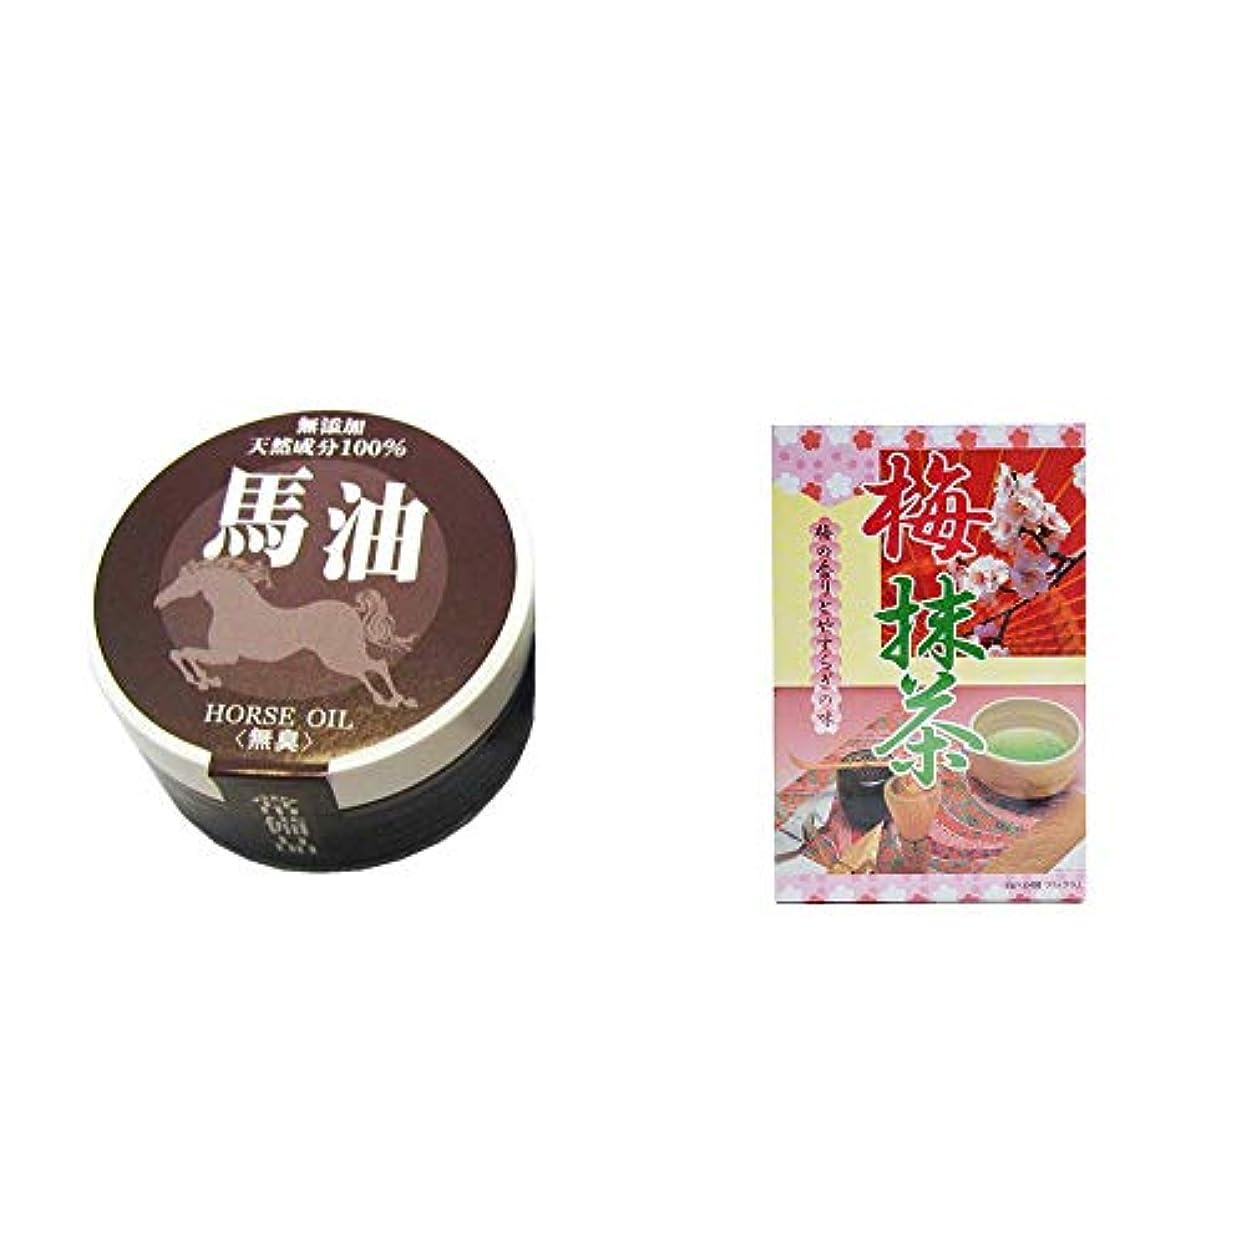 株式チーム敬[2点セット] 無添加天然成分100% 馬油[無香料](38g)?梅抹茶[大](24袋)